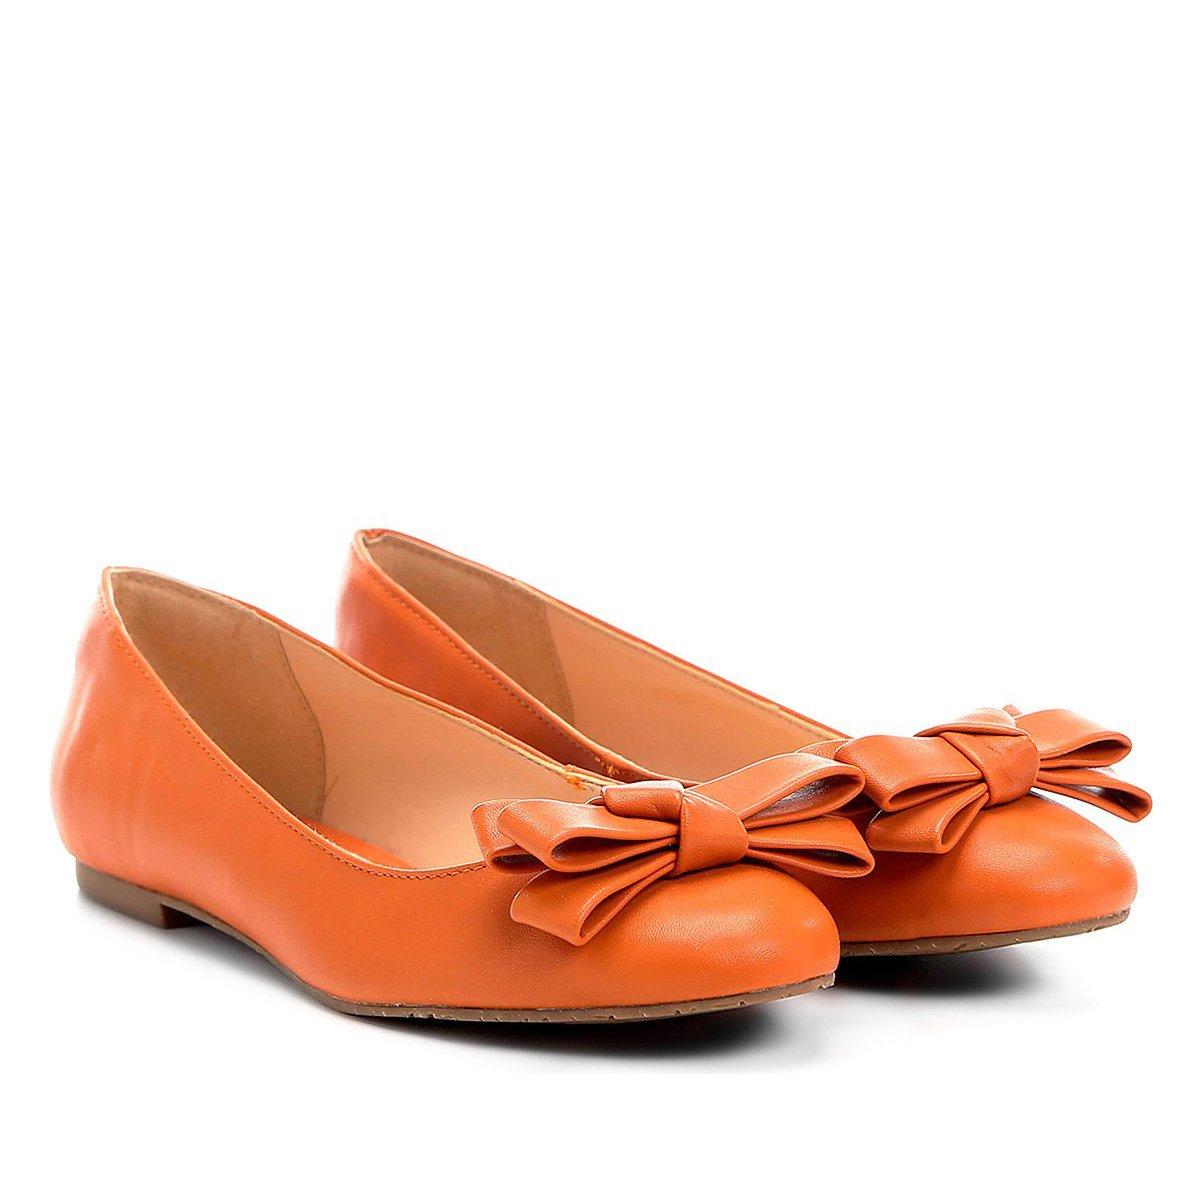 3a74984b9e ... Sapatilha Shoestock Laço Feminina